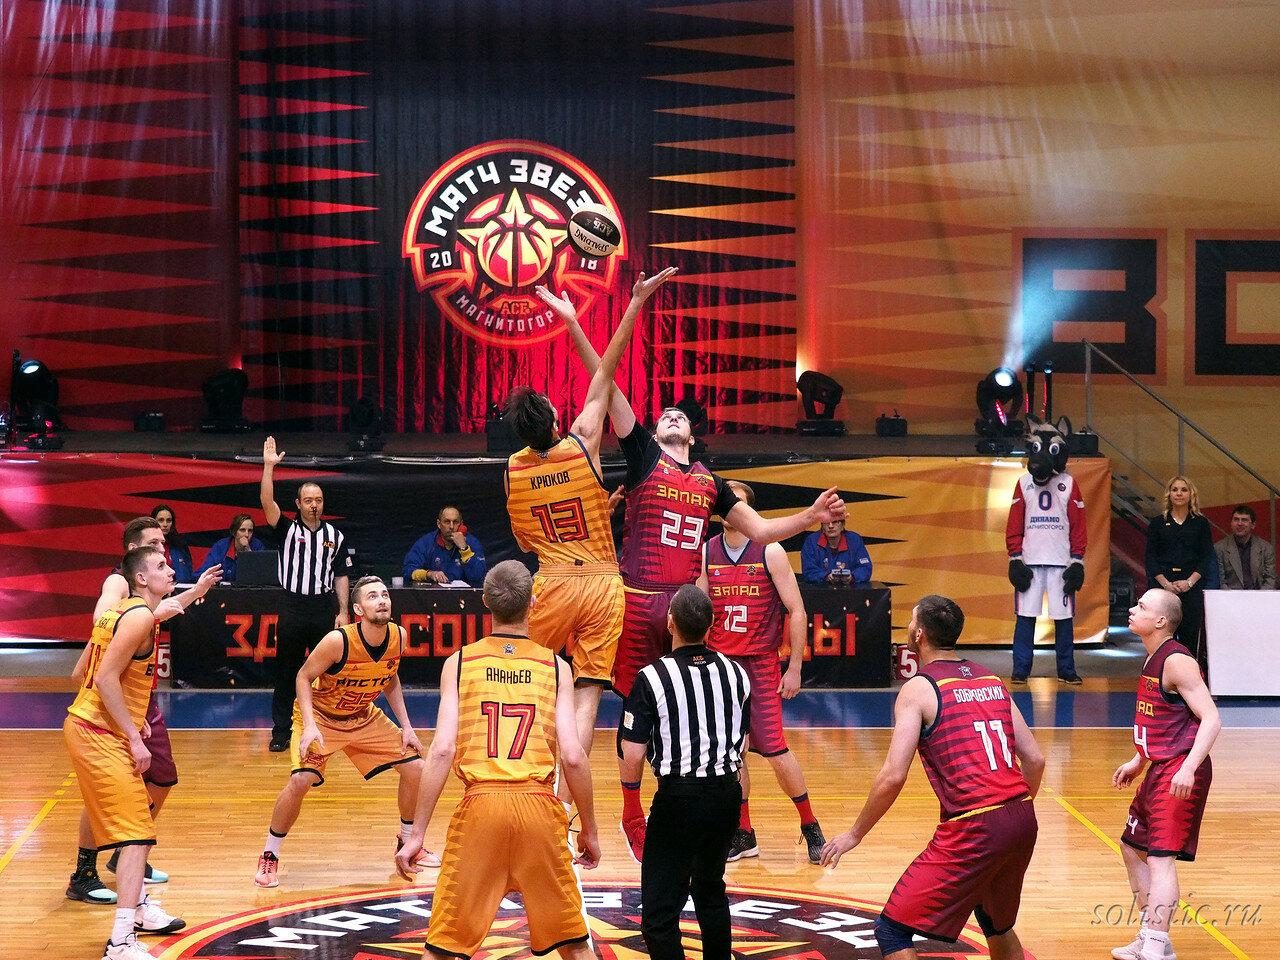 59 Матч звезд АСБ 2018 (ассоциации студенческого баскетбола)